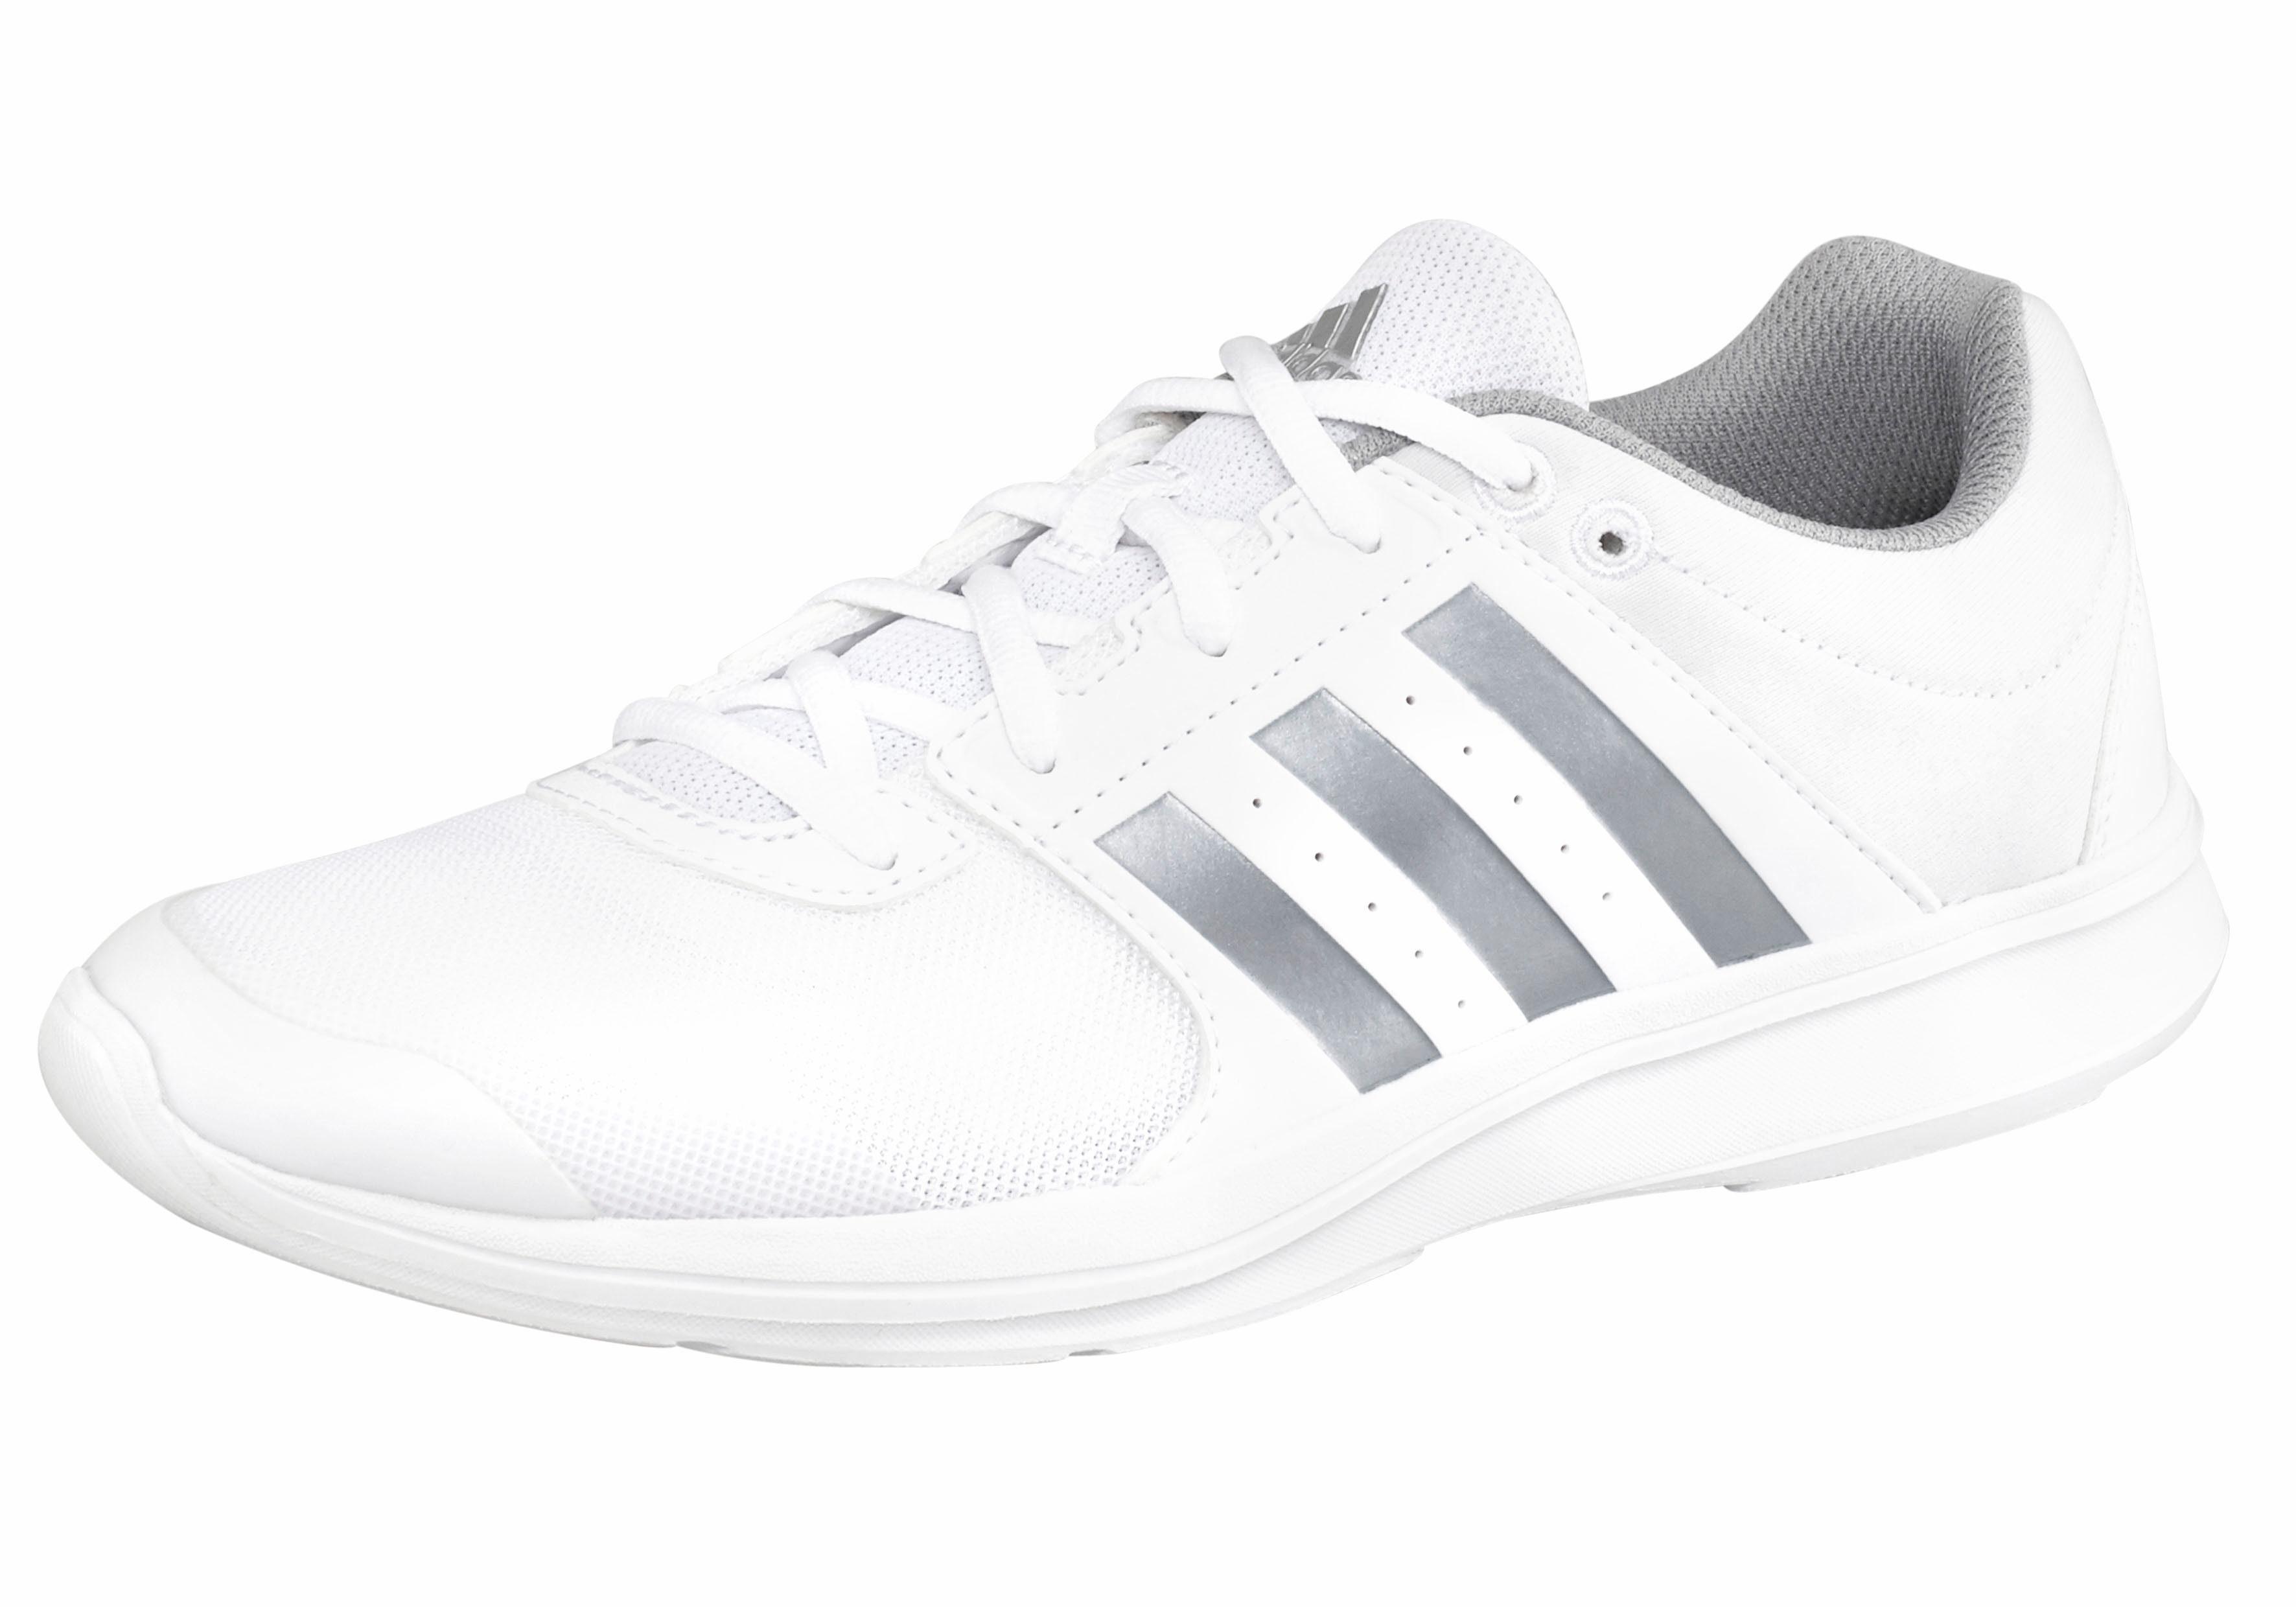 Adidas Online Damenschuhe KaufenOtto Adidas Damenschuhe Adidas Adidas KaufenOtto Online Damenschuhe Online KaufenOtto H9D2WEIY